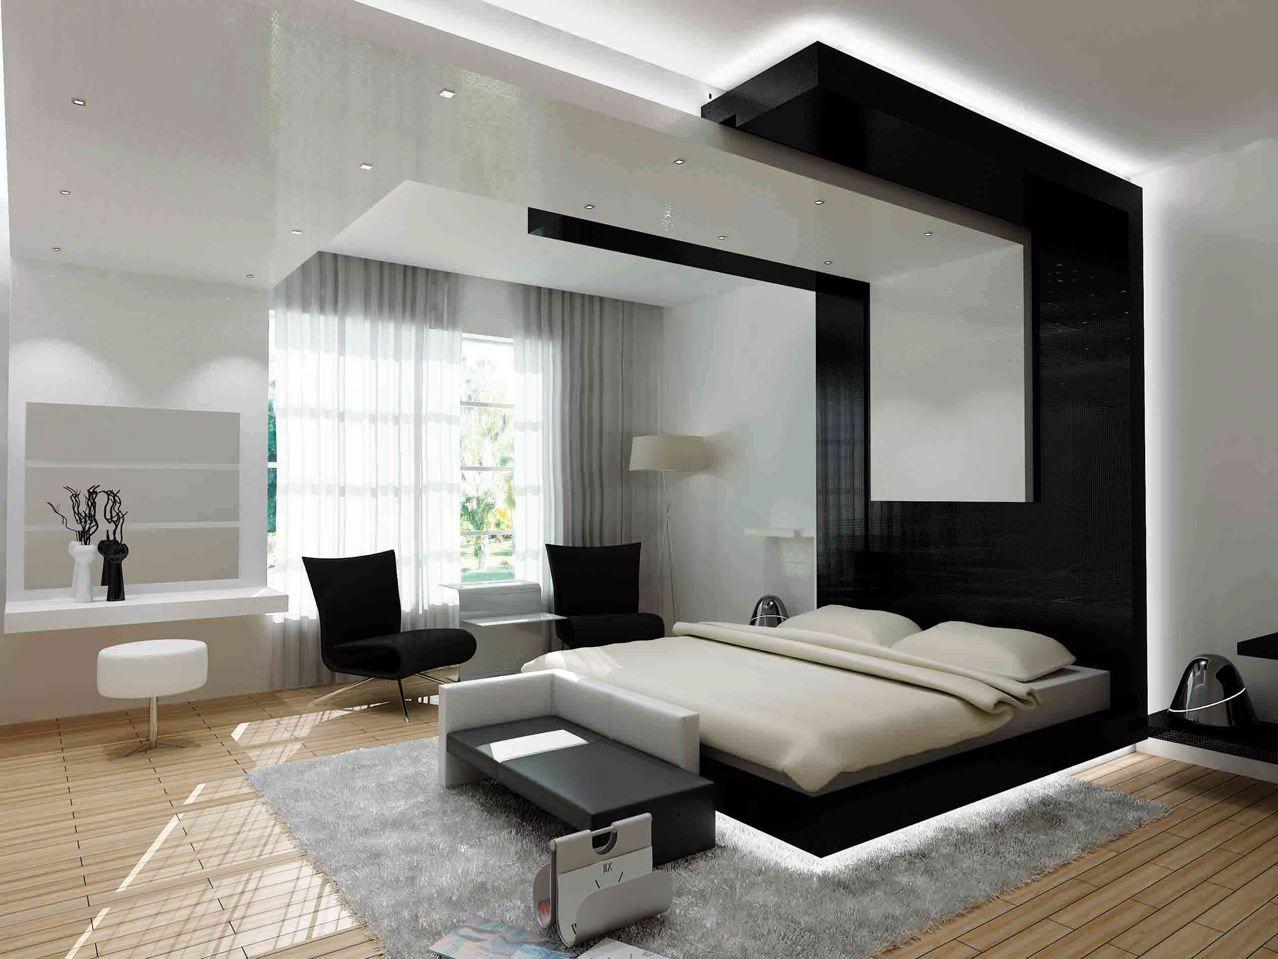 Recamaras Modernas Buscar Con Google Ideas Para El Hogar  ~ Como Pintar Una Habitacion De Matrimonio Moderna